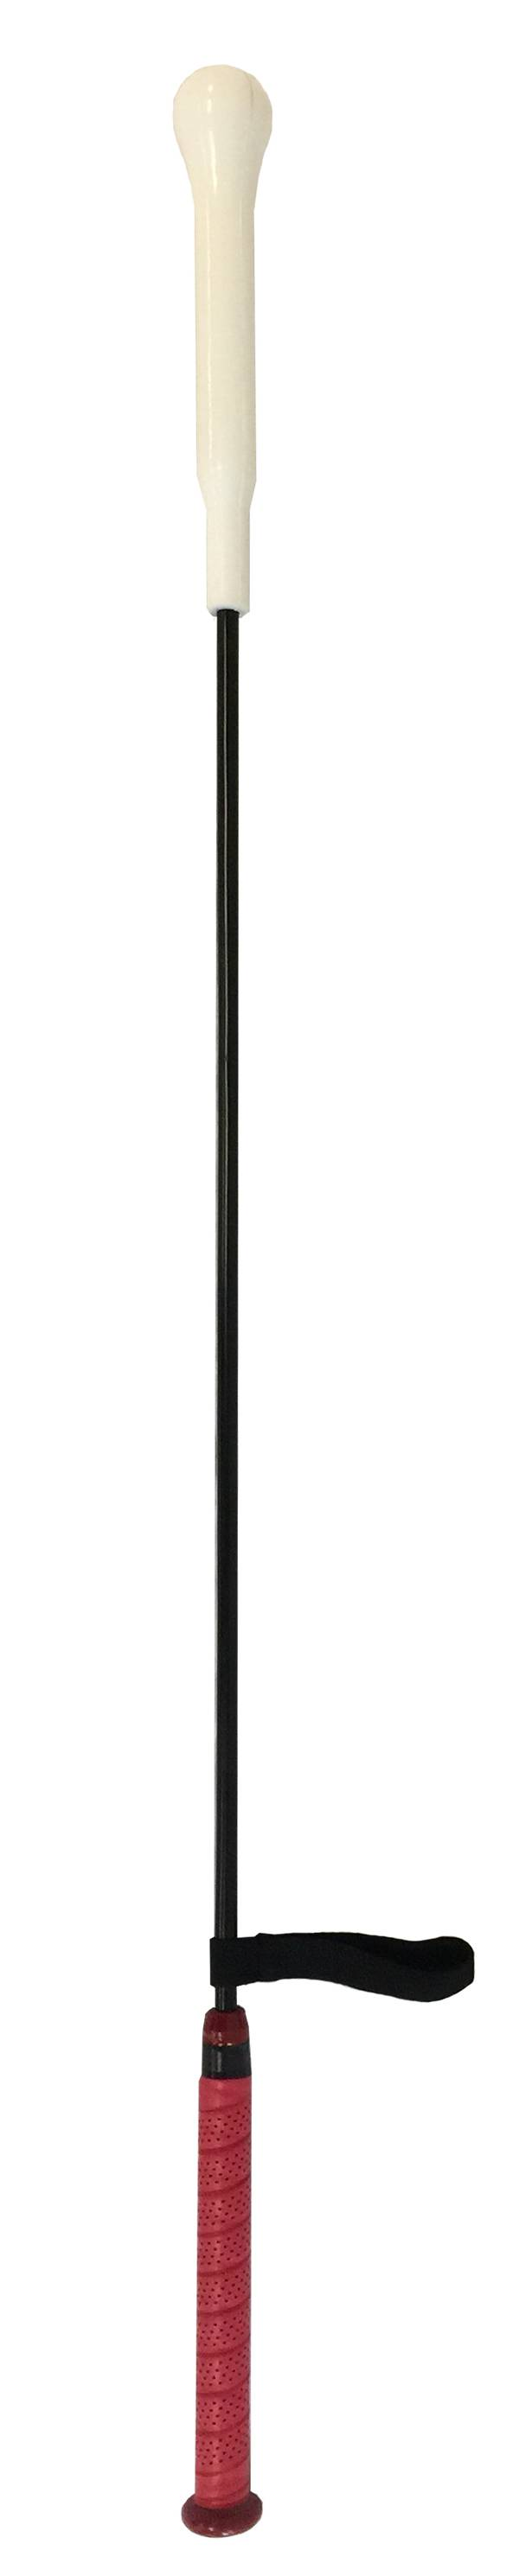 Rawlings HITSTIK Swing Trainer product image